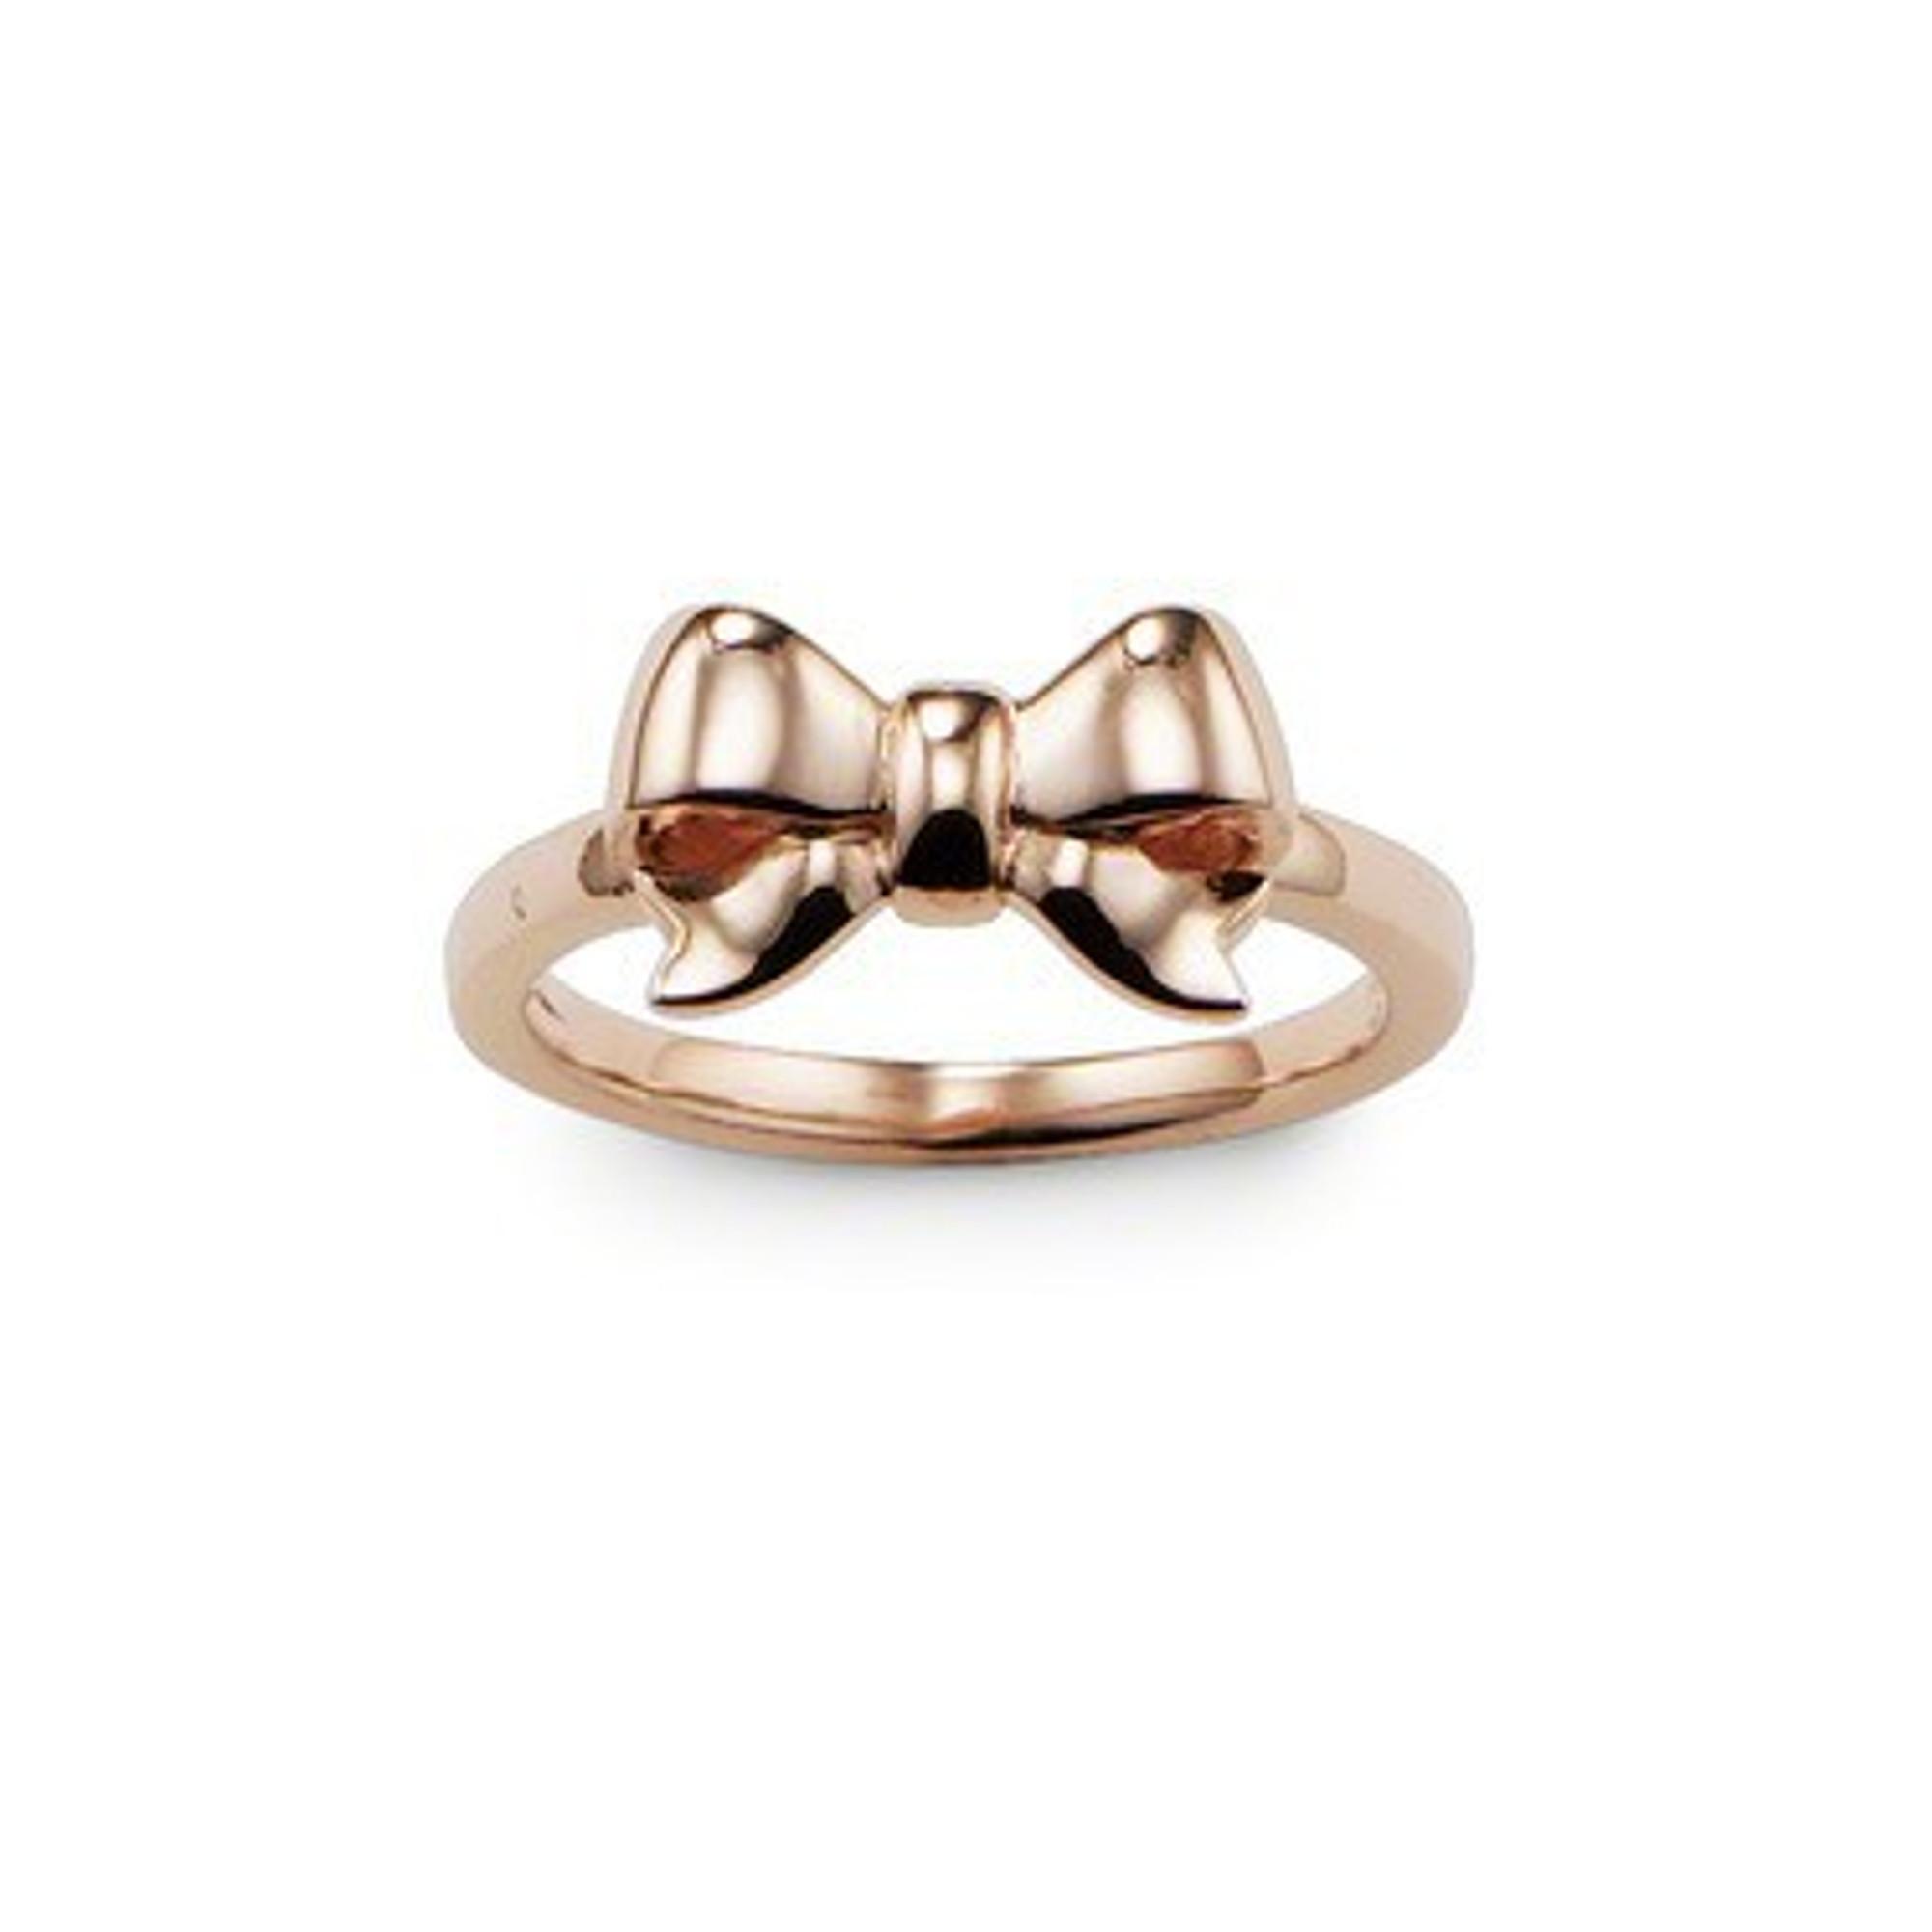 THOMAS SABO Ring TR1977-415-12-52